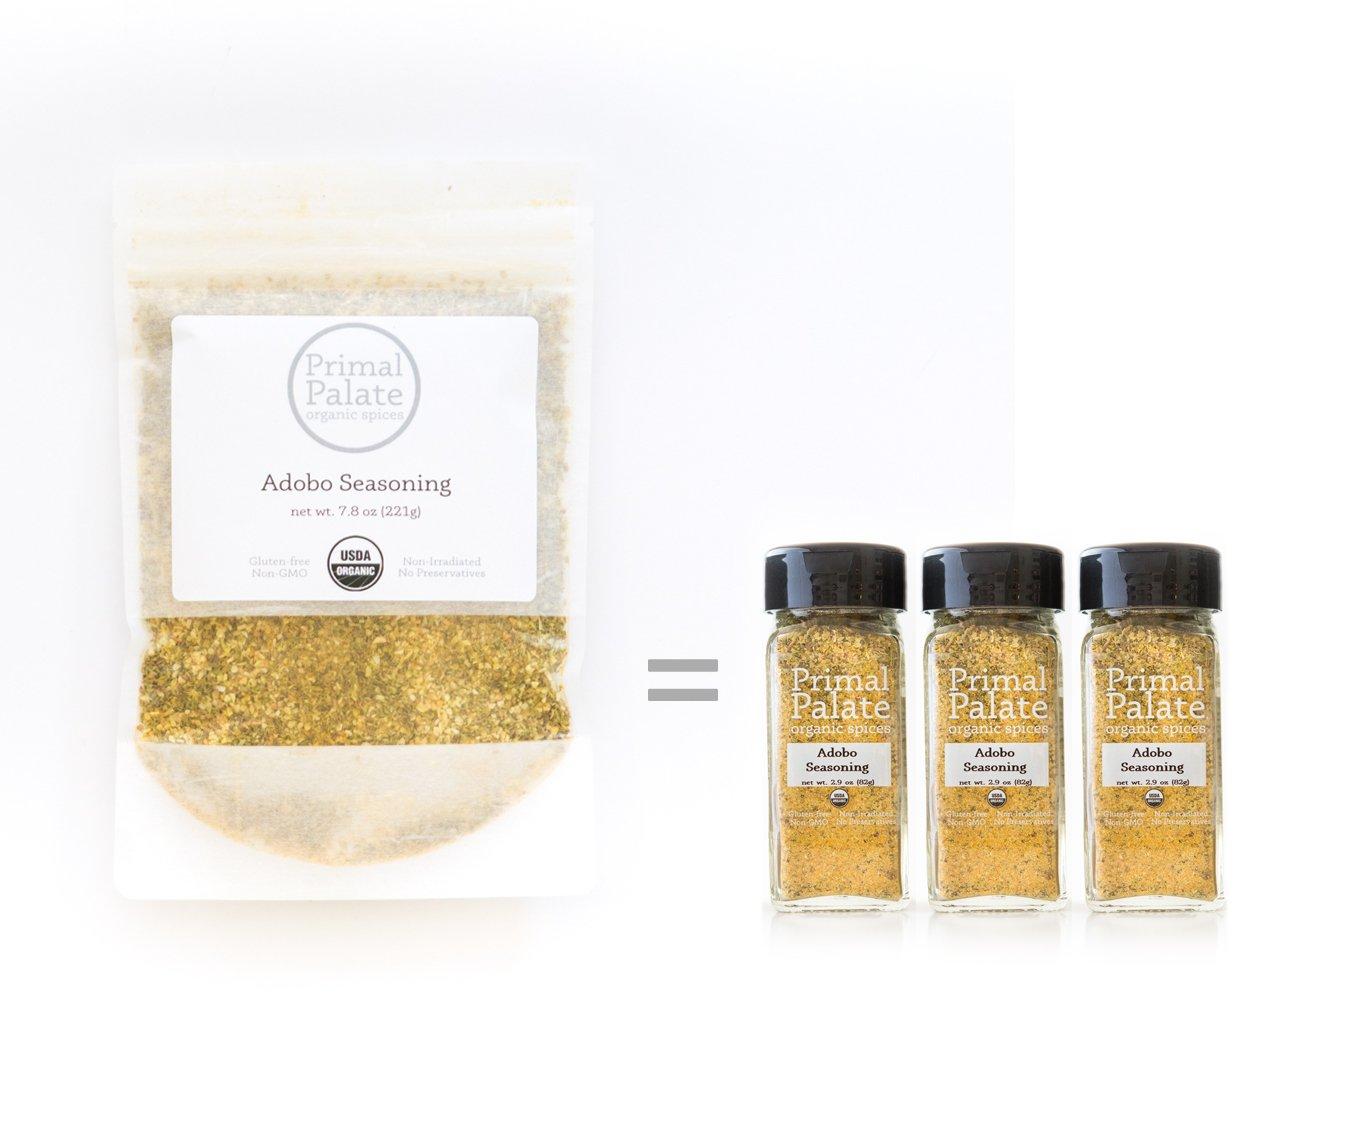 Primal Palate Organic Spices, Adobo Seasoning, Certified Organic, 7.8 oz resealable bag